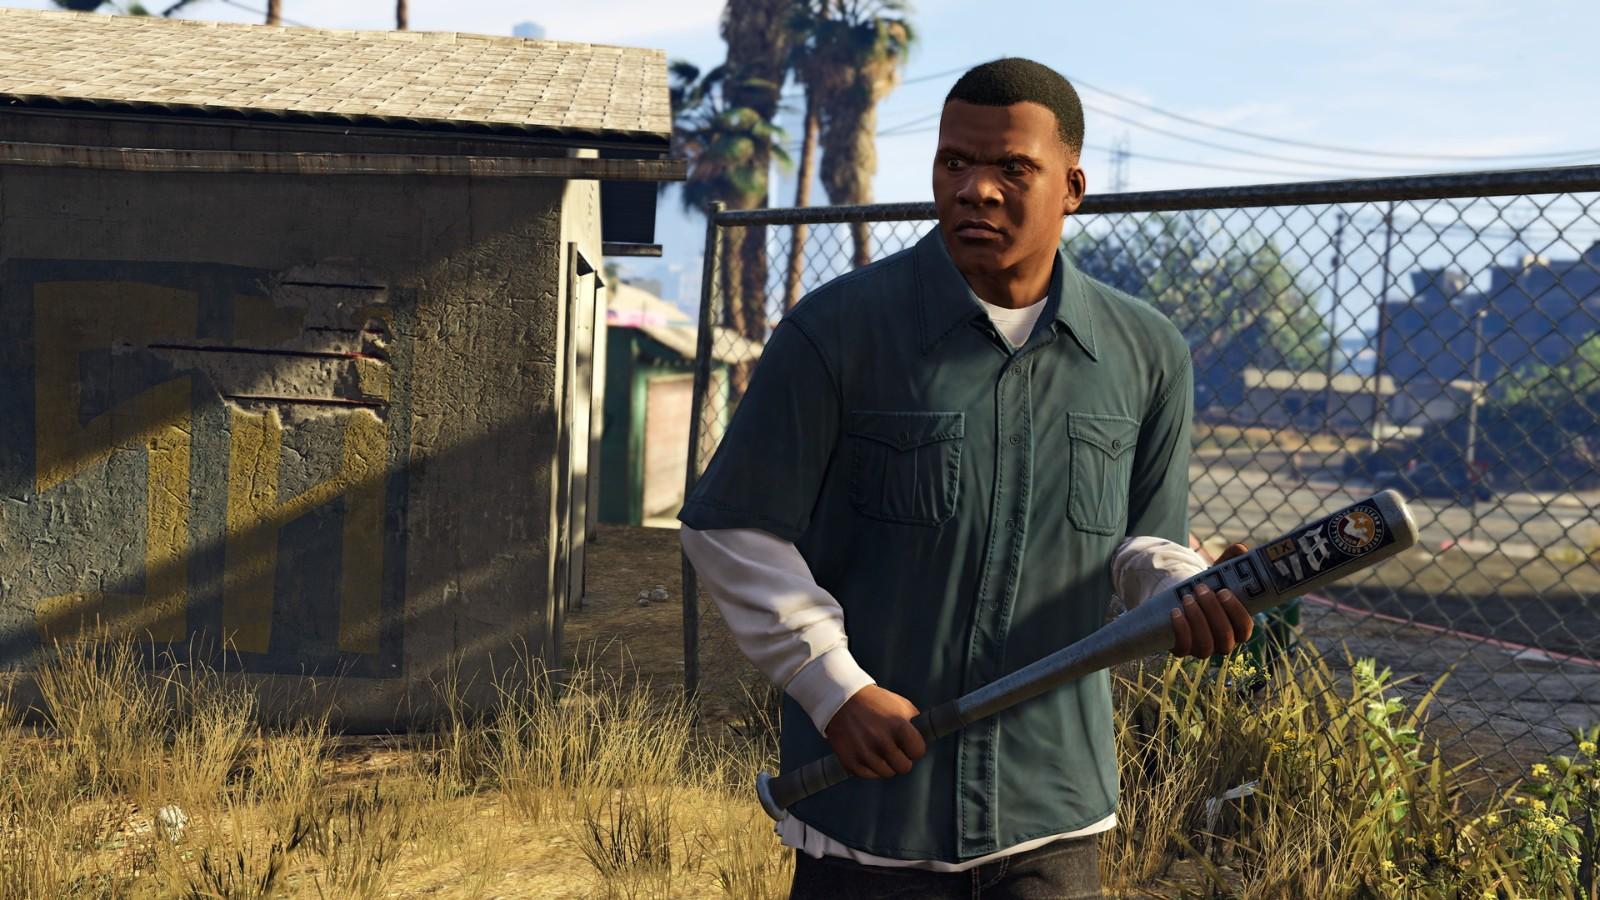 《GTA5》玩家不滥杀无辜通关 但最终死亡人数是726人